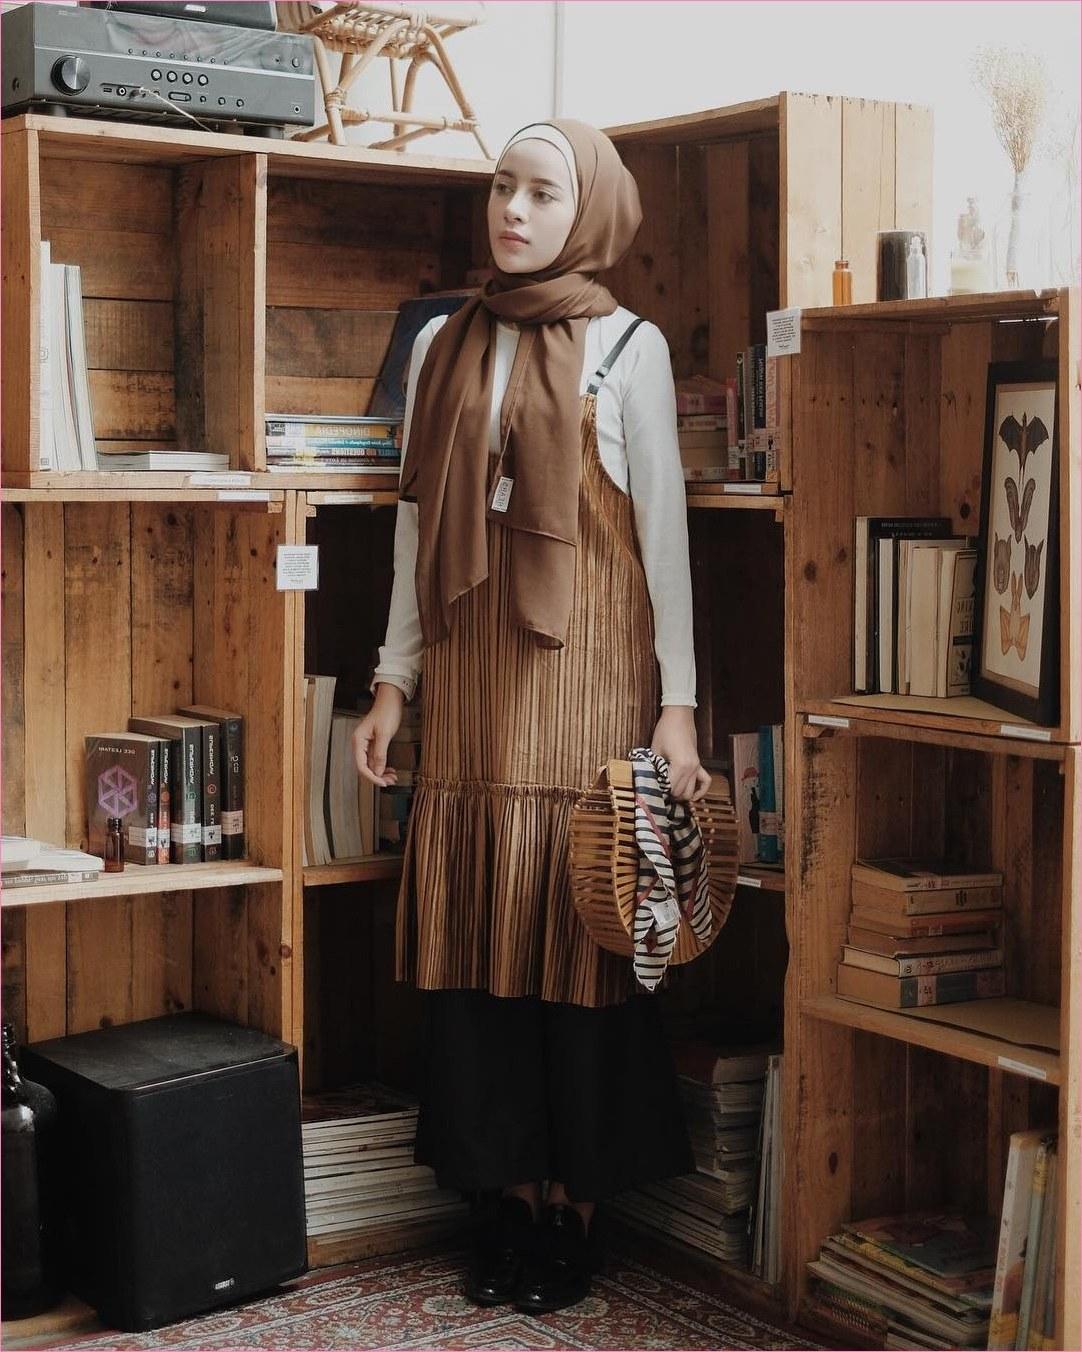 Model Model Baju Lebaran 2019 Wanita U3dh 80 Model Baju Lebaran Terbaru 2019 Muslimah Trendy Model